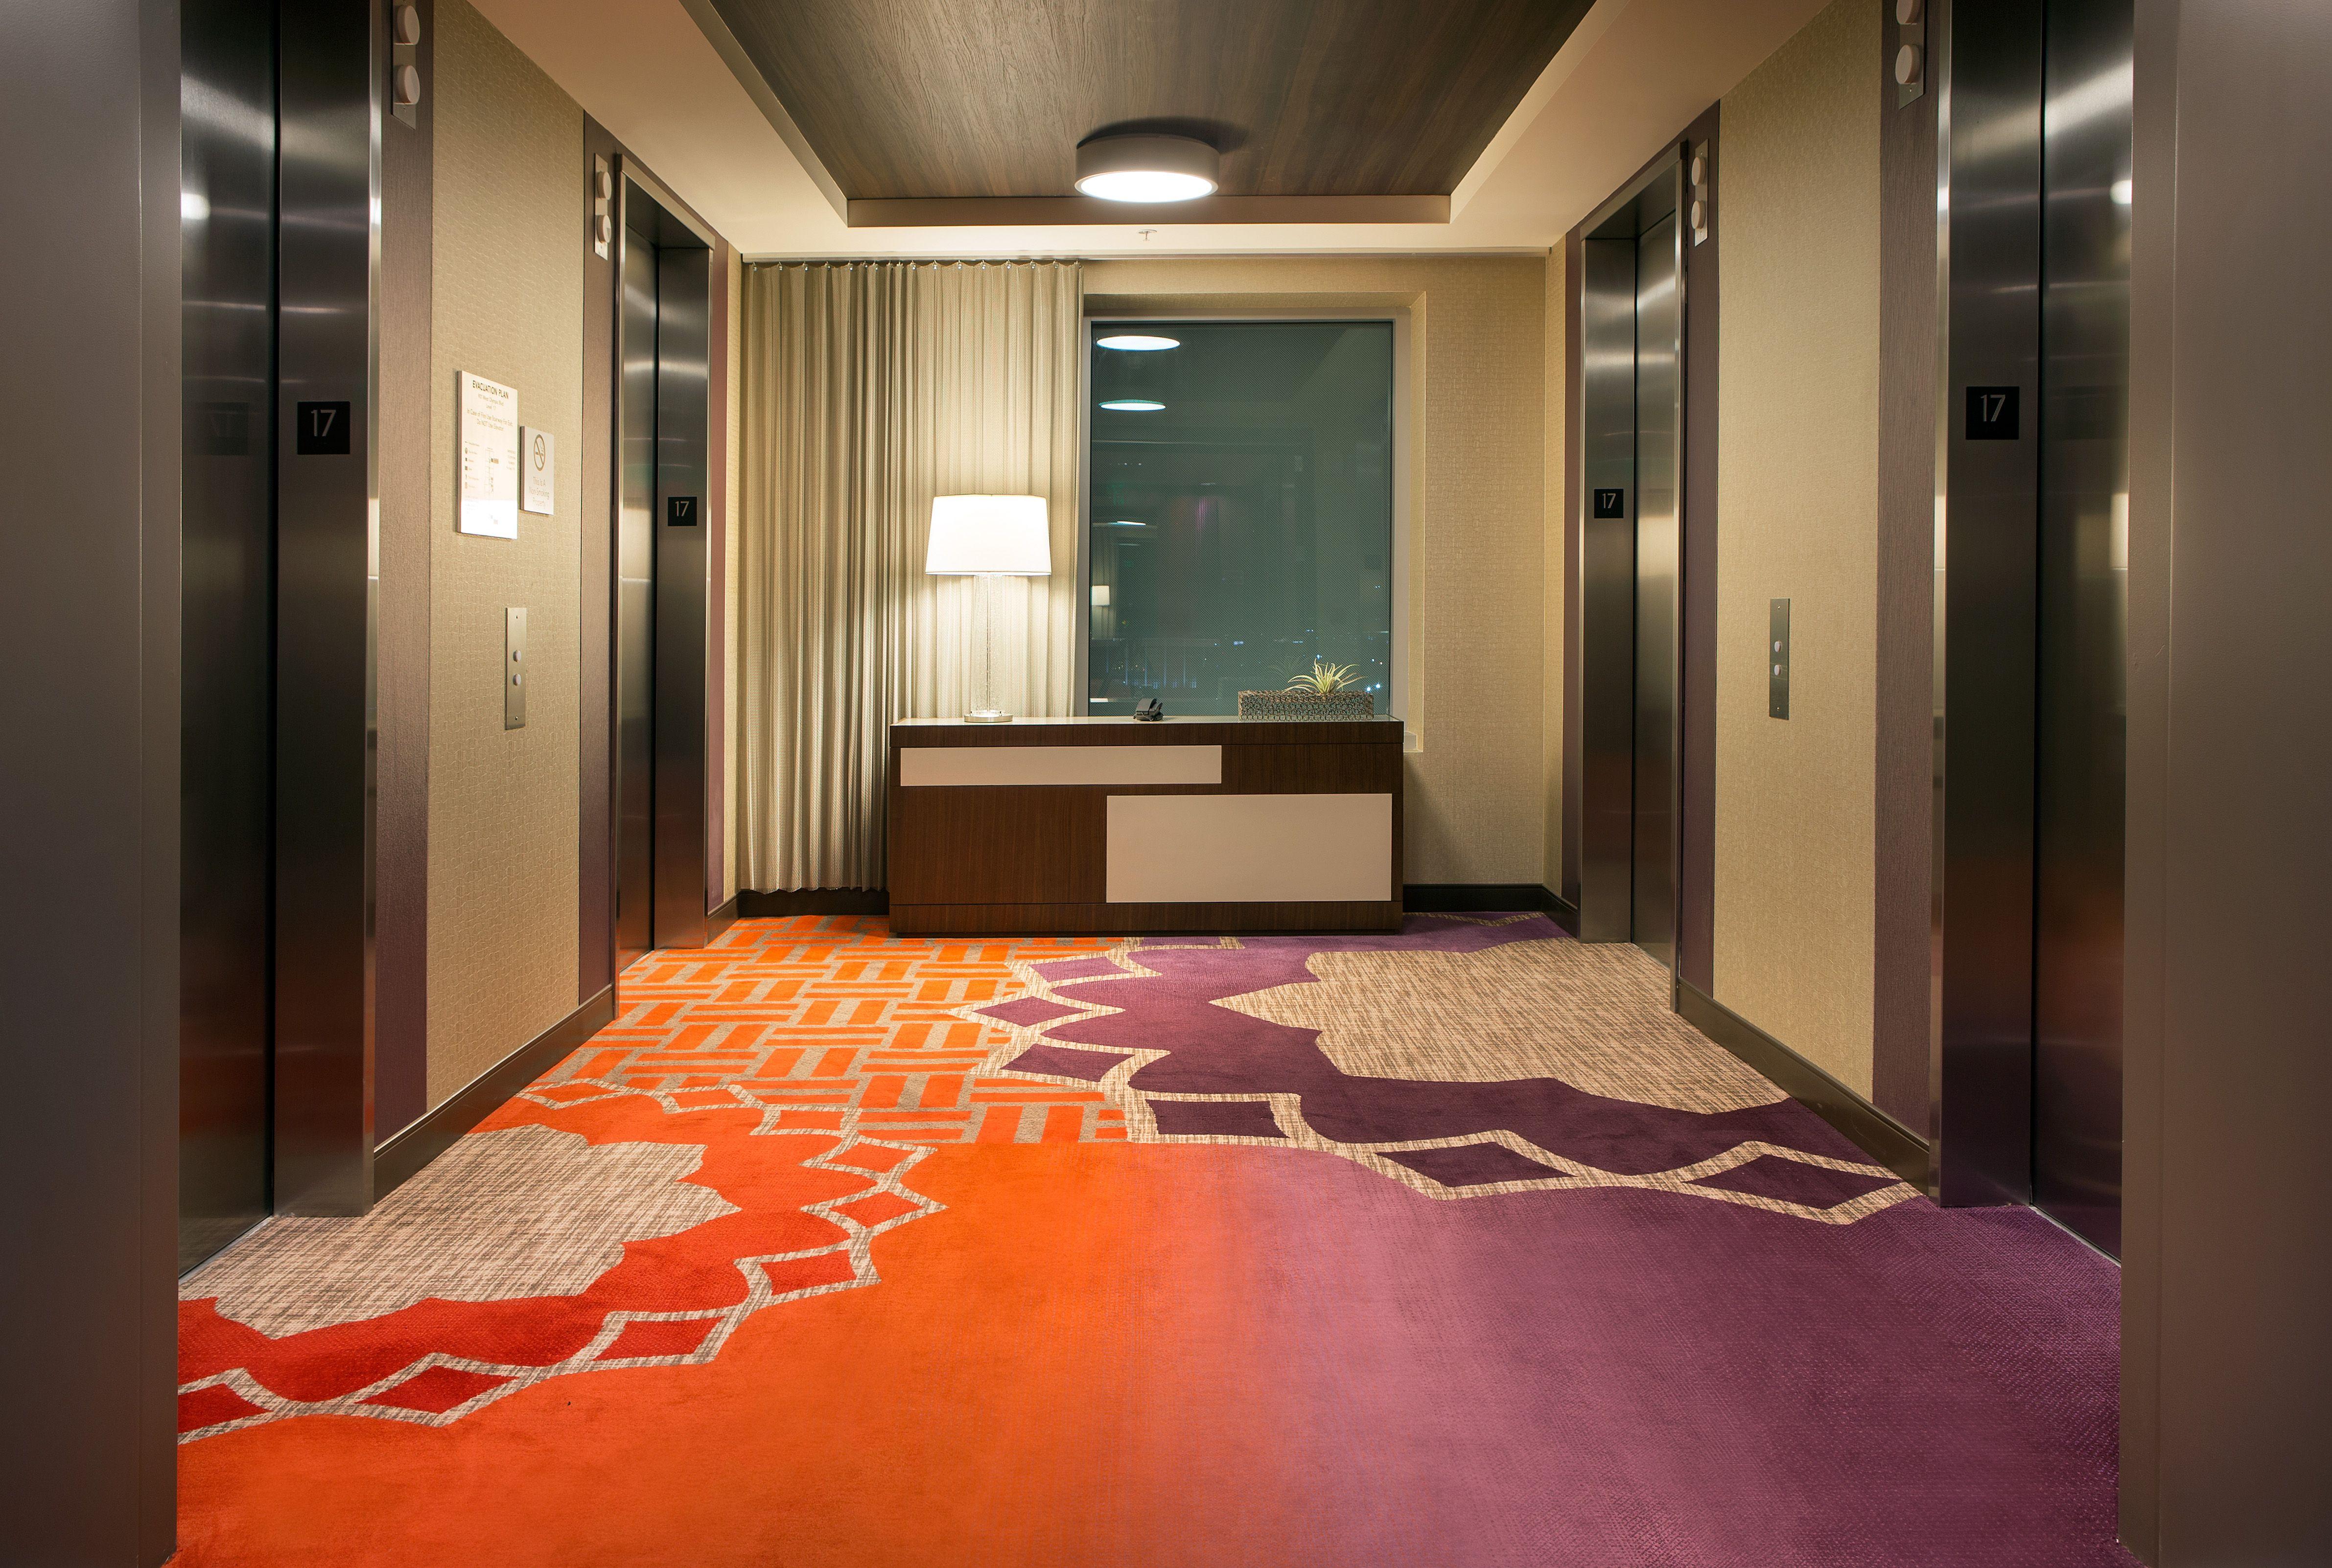 Degen Degen Hospitality Interior Architecture Design Interior Design Firms Hotel Concept